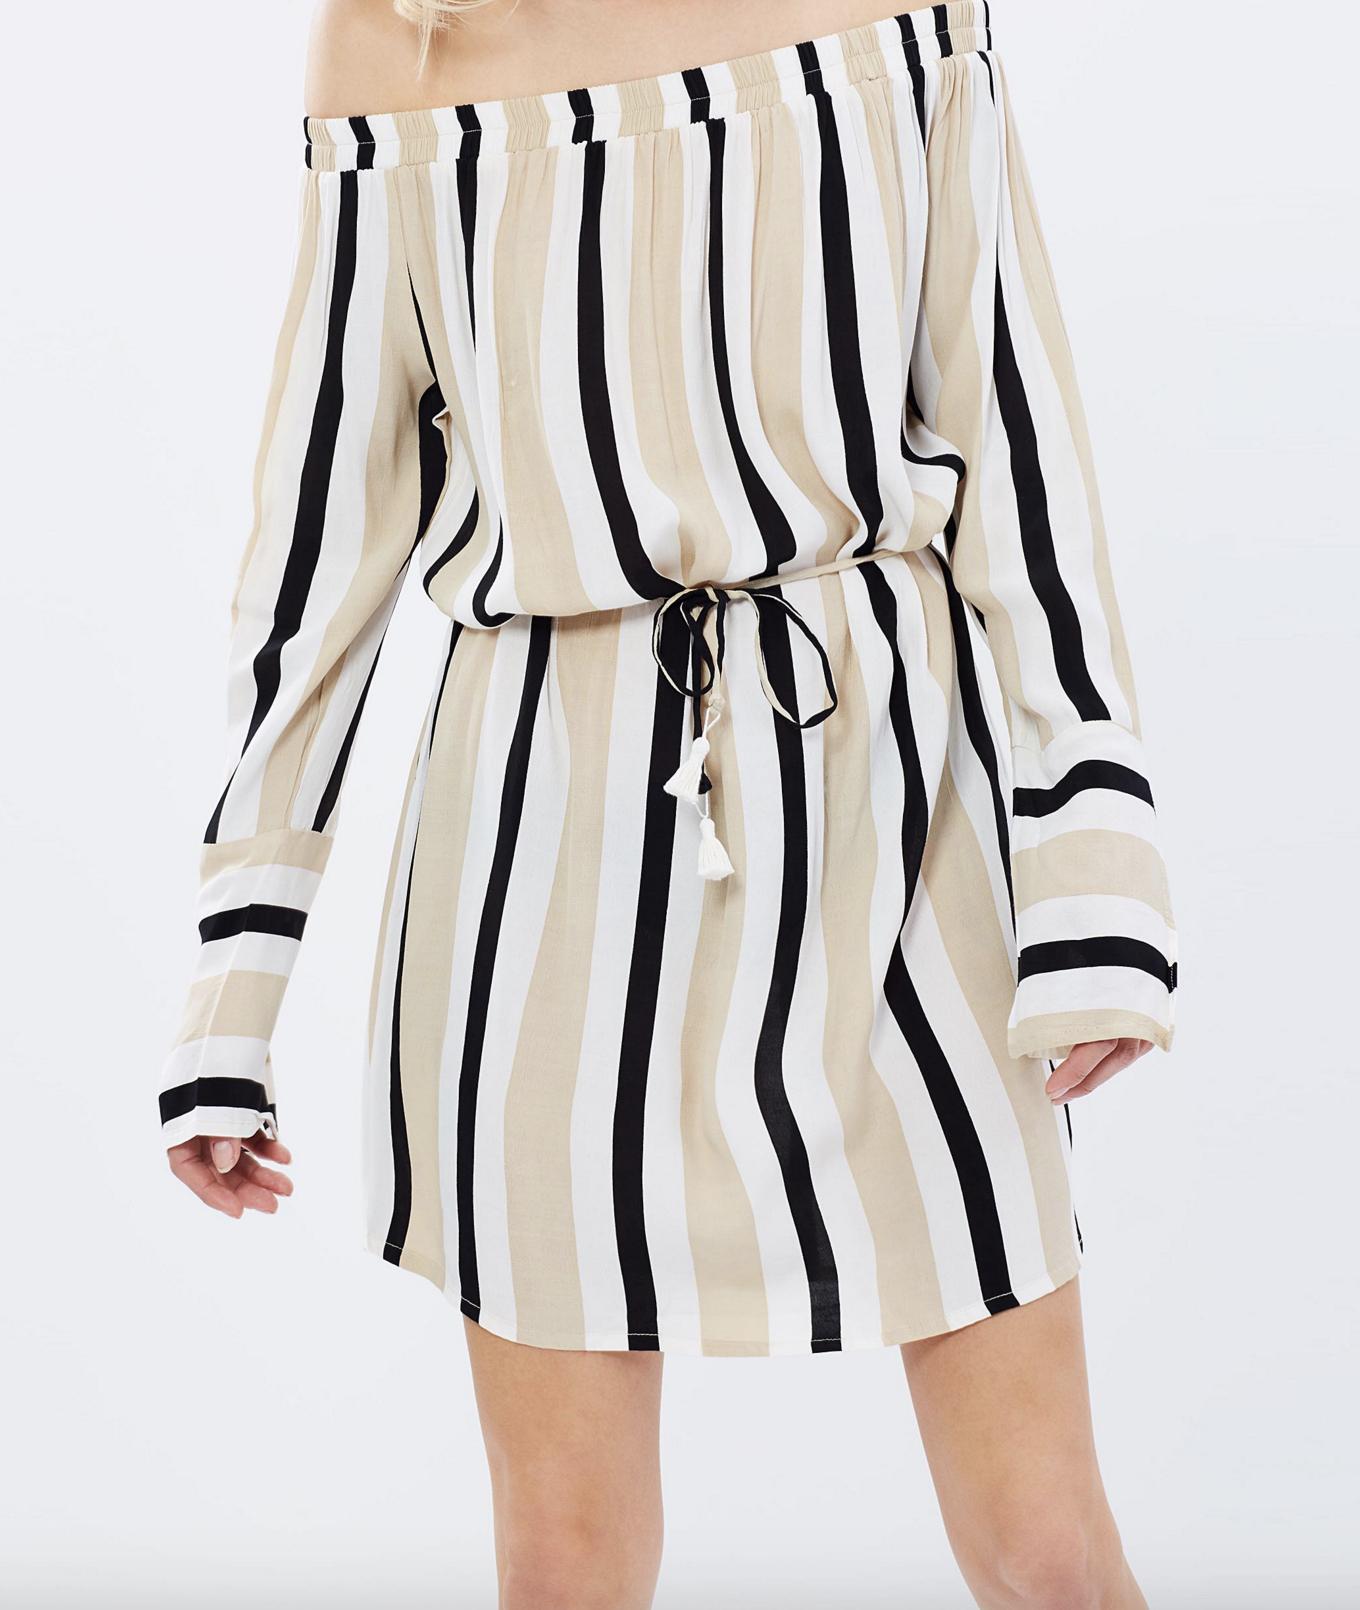 Faithfull naumi dress $140